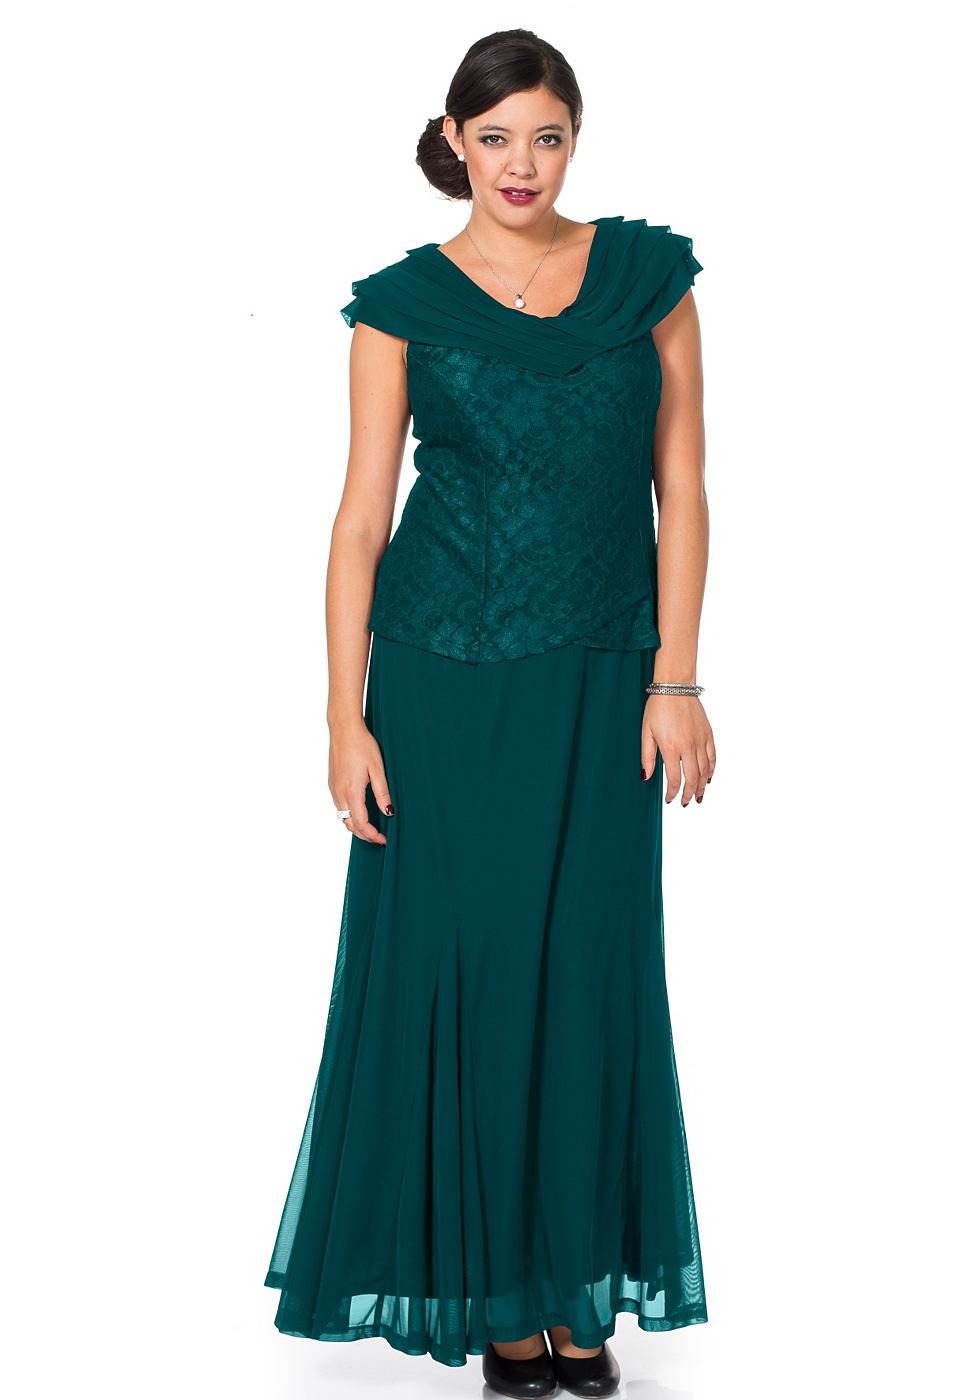 M.I.M jurk met sjaalkraag groen